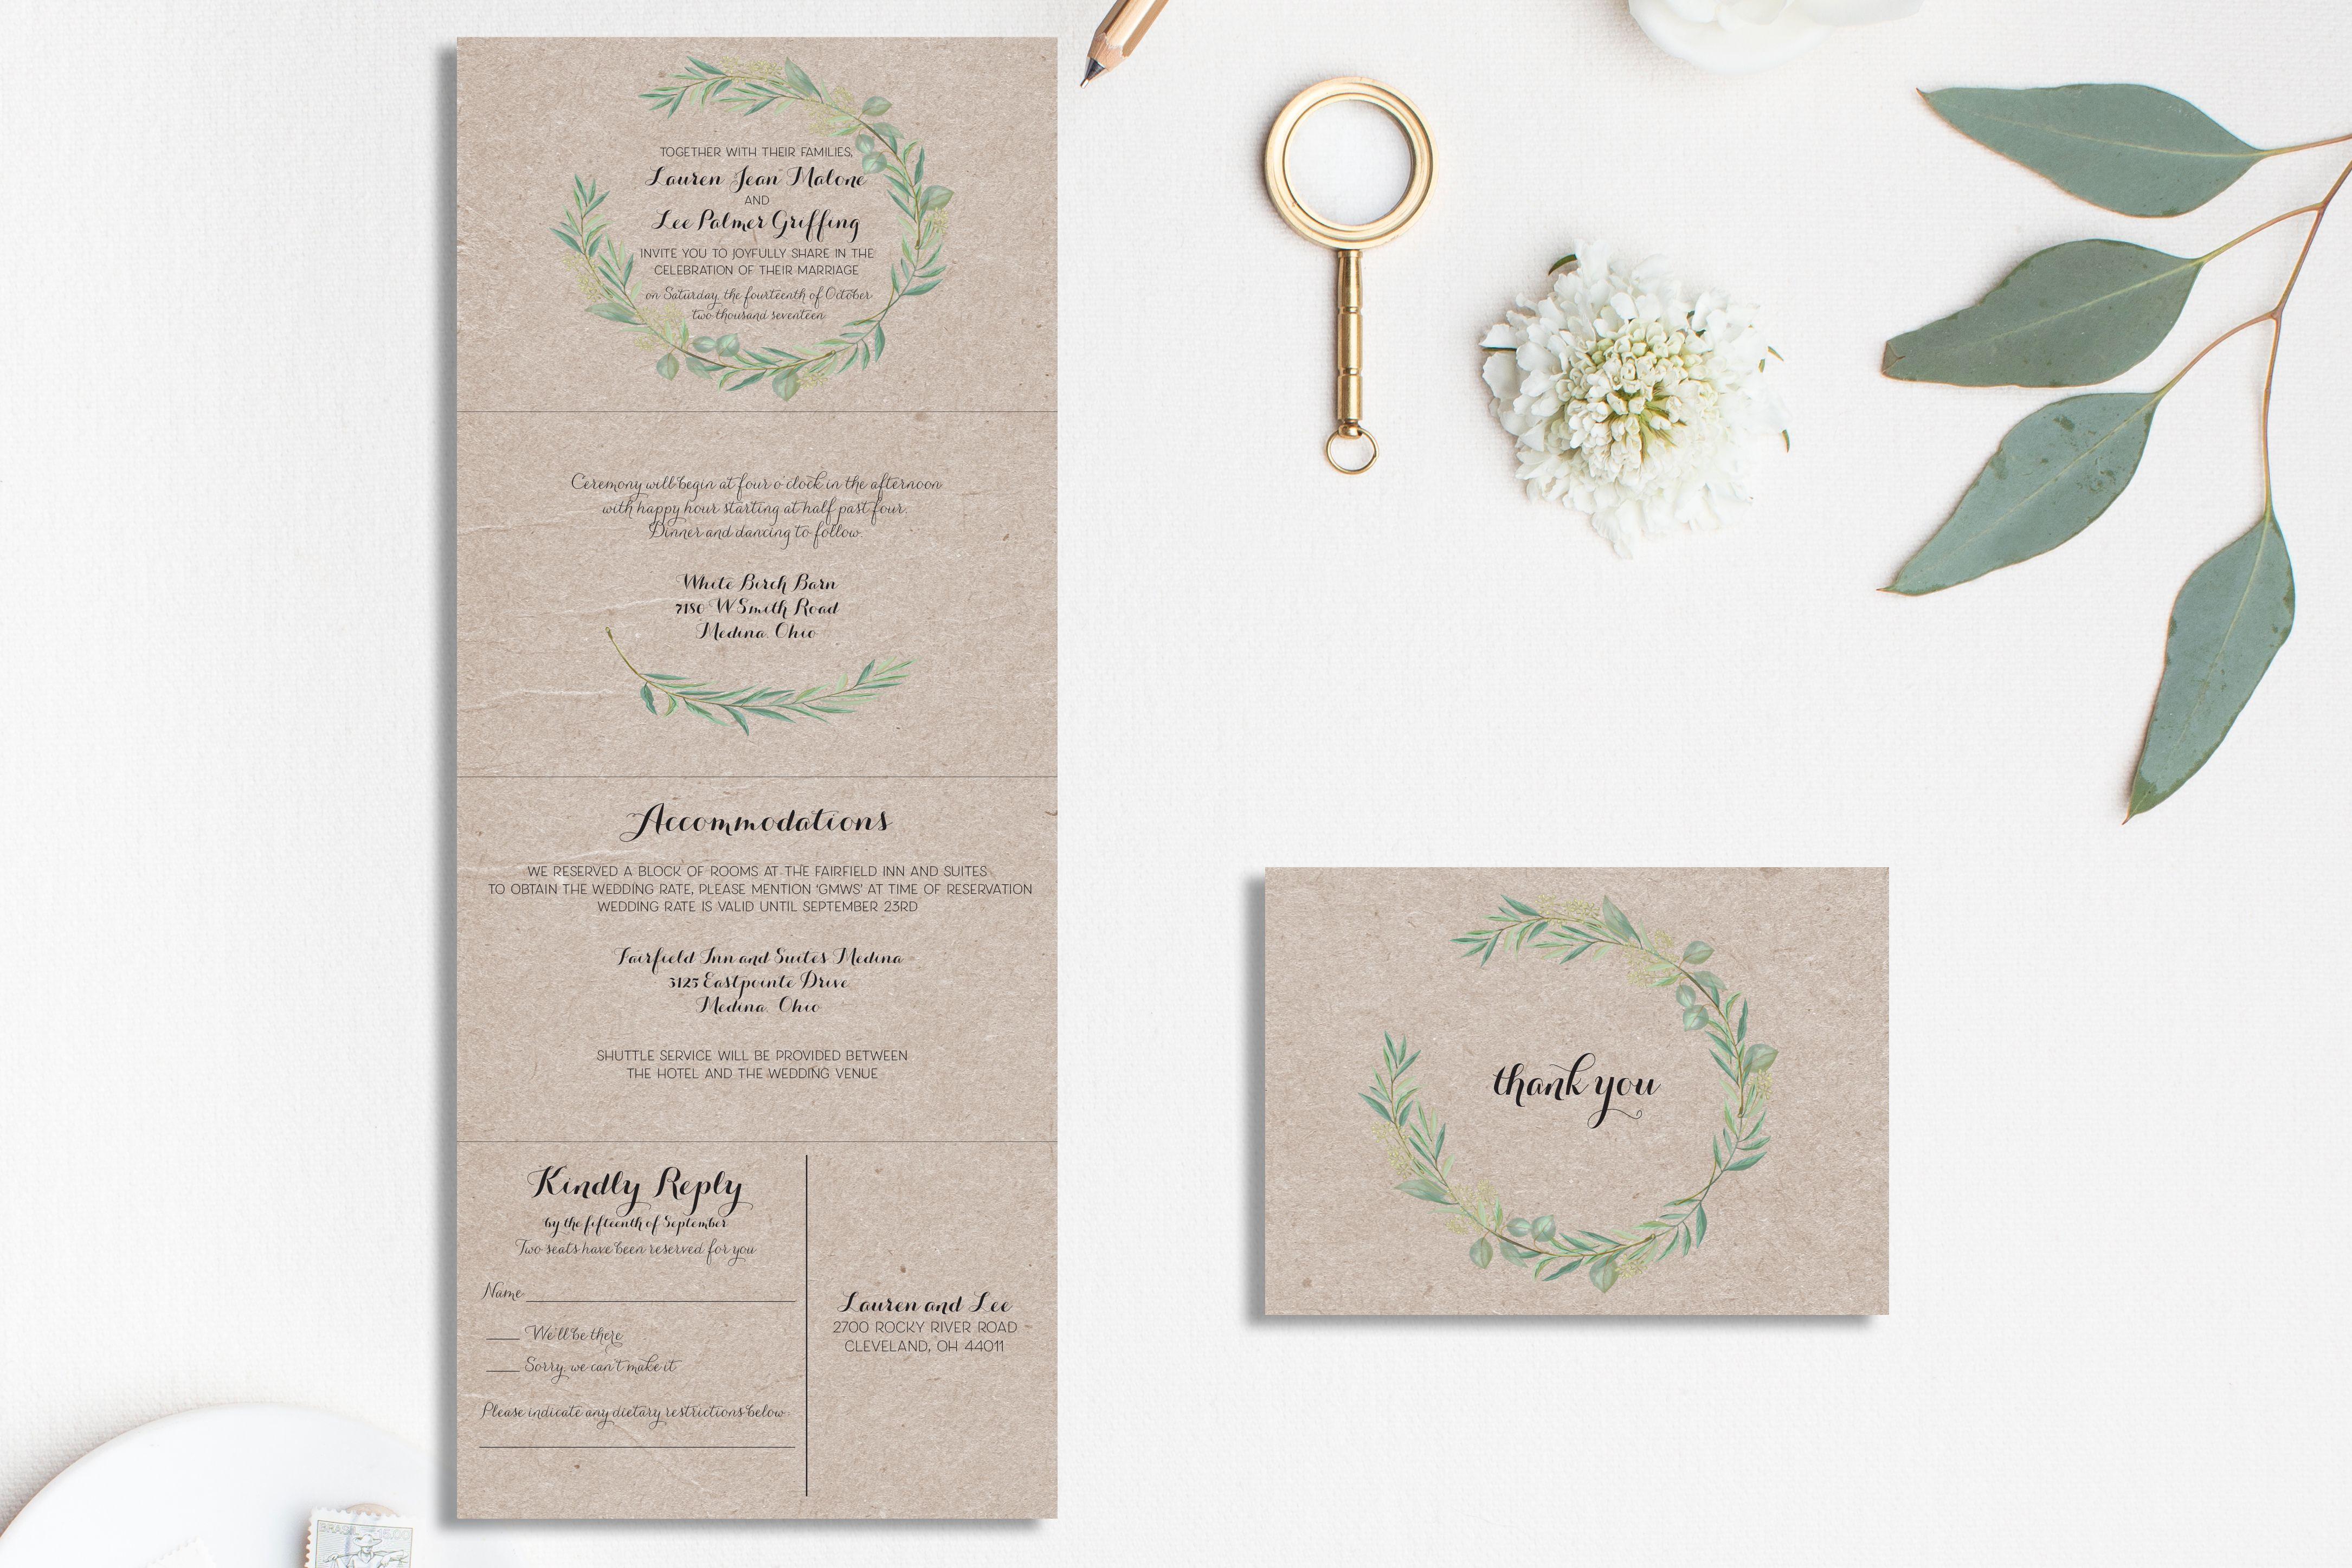 Rustic wedding invitation | Kraft wedding invitation | Folded wedding  invitat… | Tri fold wedding invitations, Folded wedding invitation, Wedding  invitations rustic